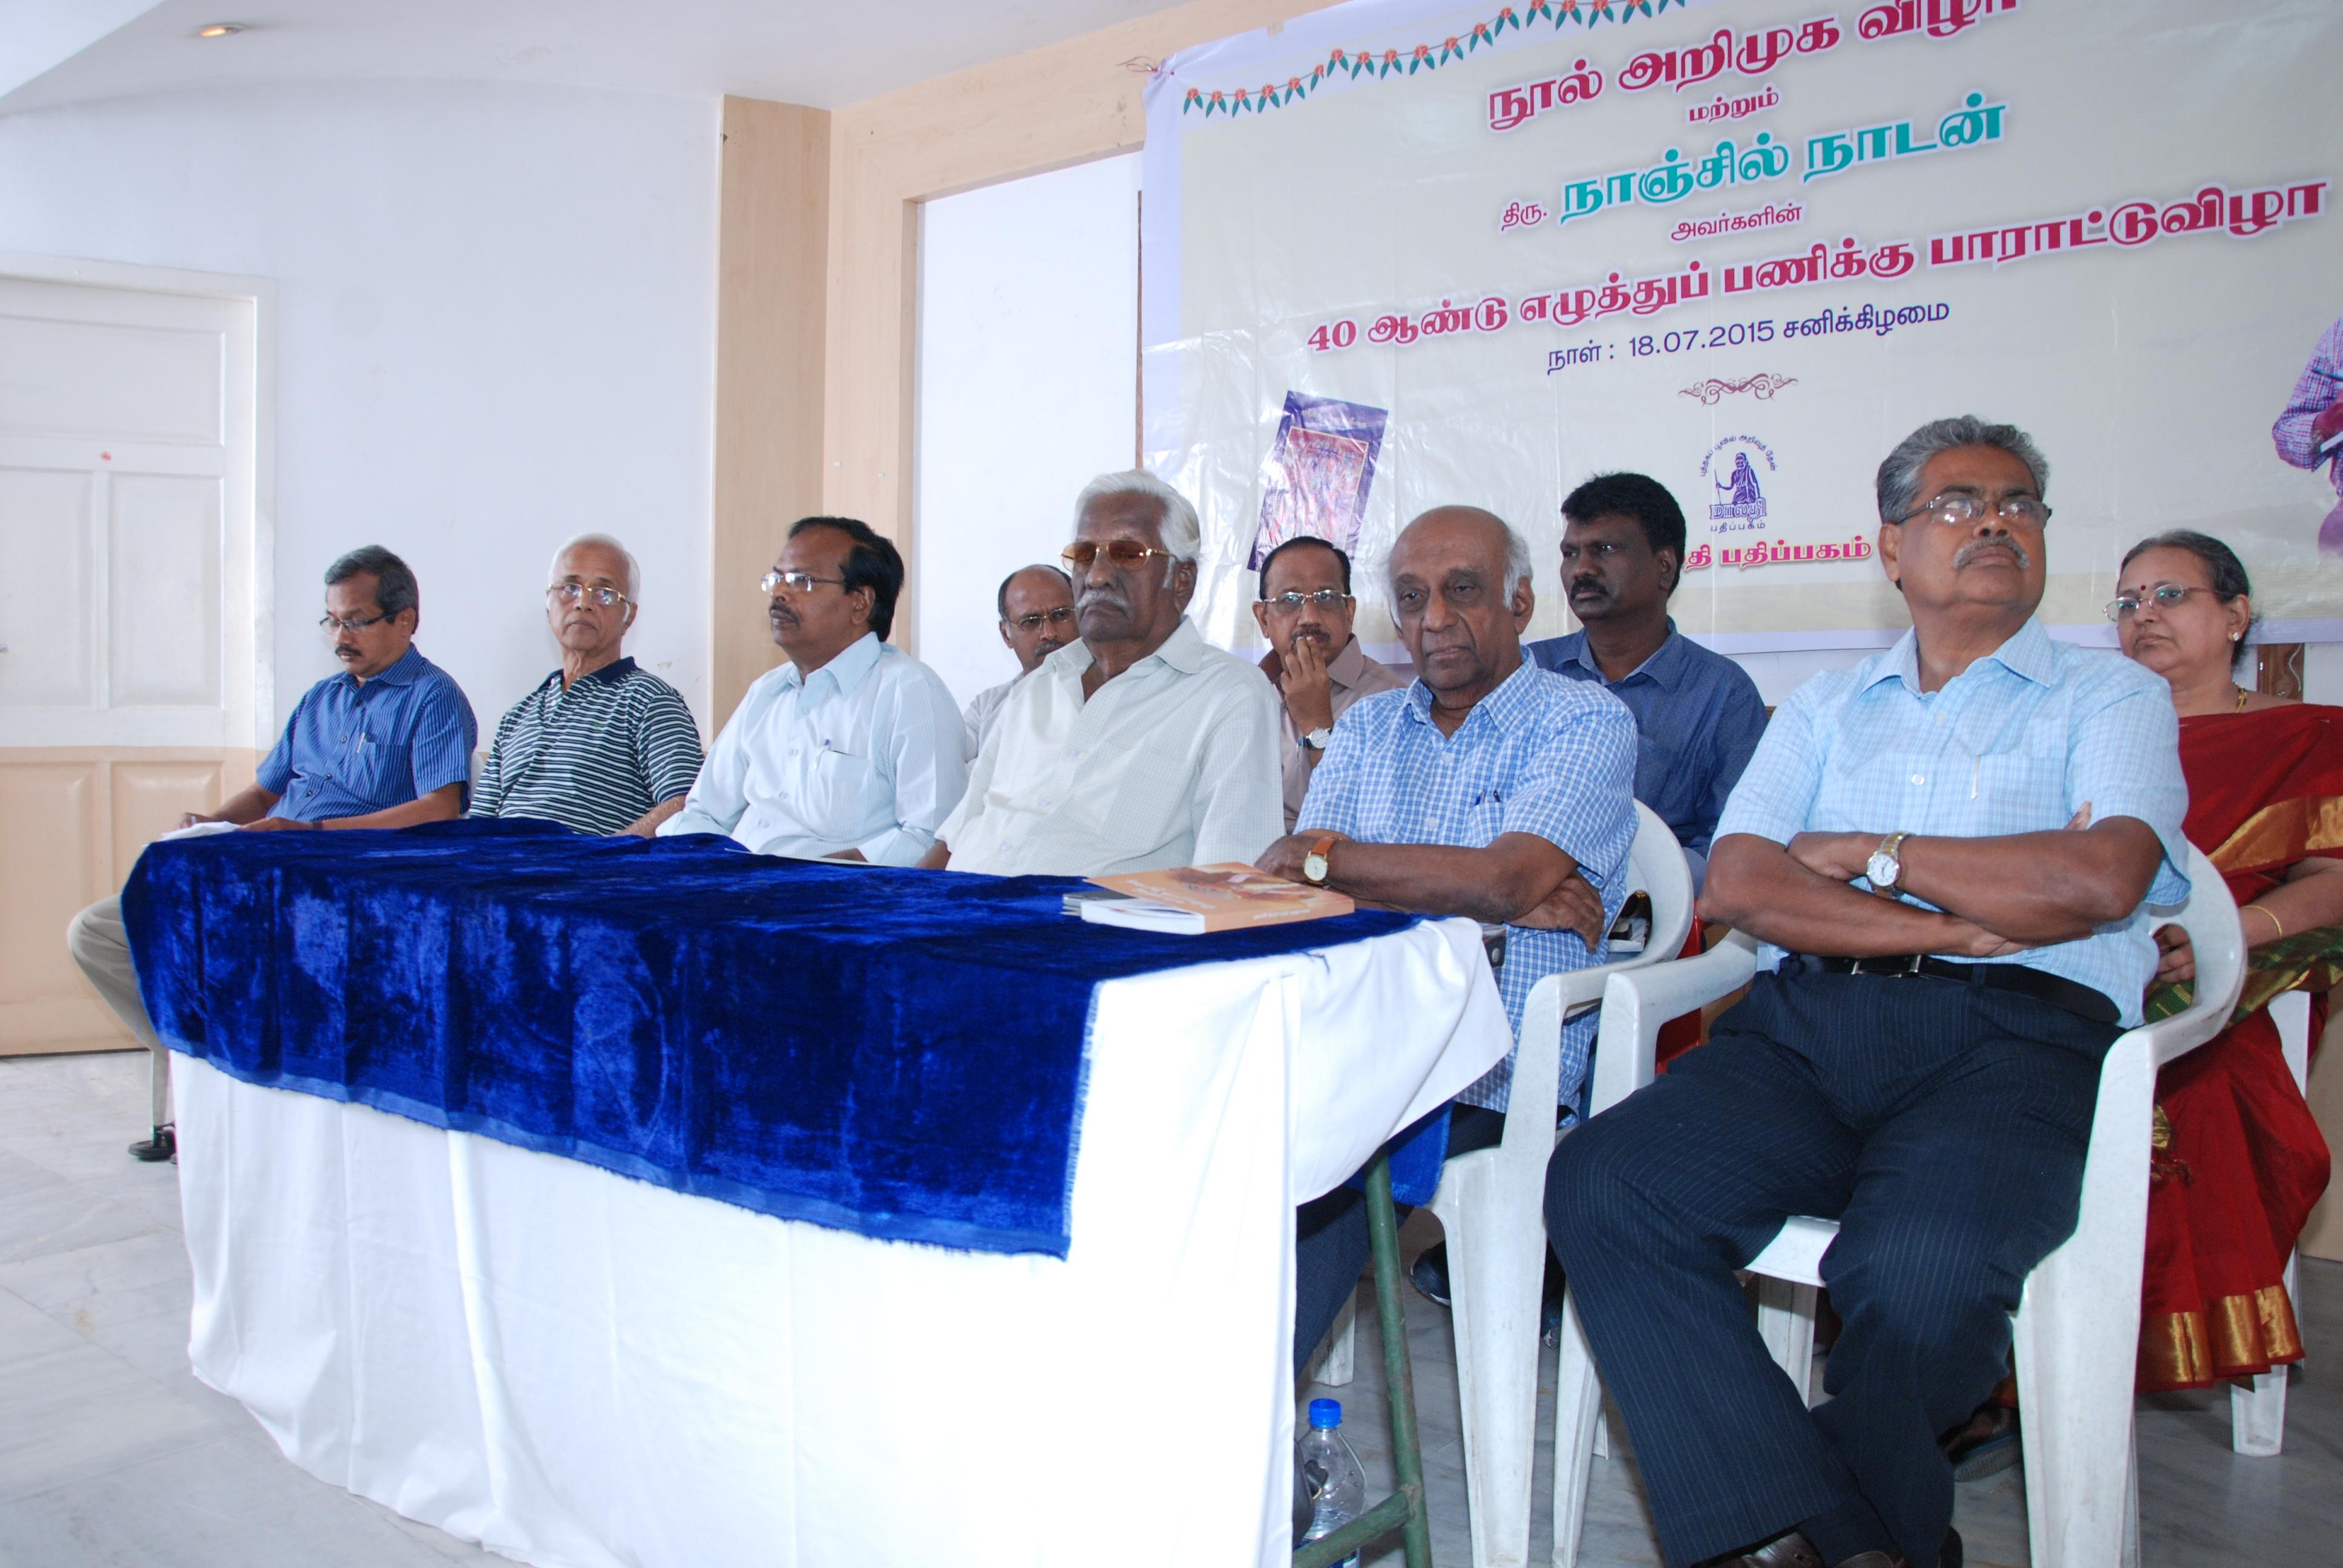 Nanjil_Nadan_VaSri_Events_Lectures_Talks_Stage_Meets_Shrinivasan